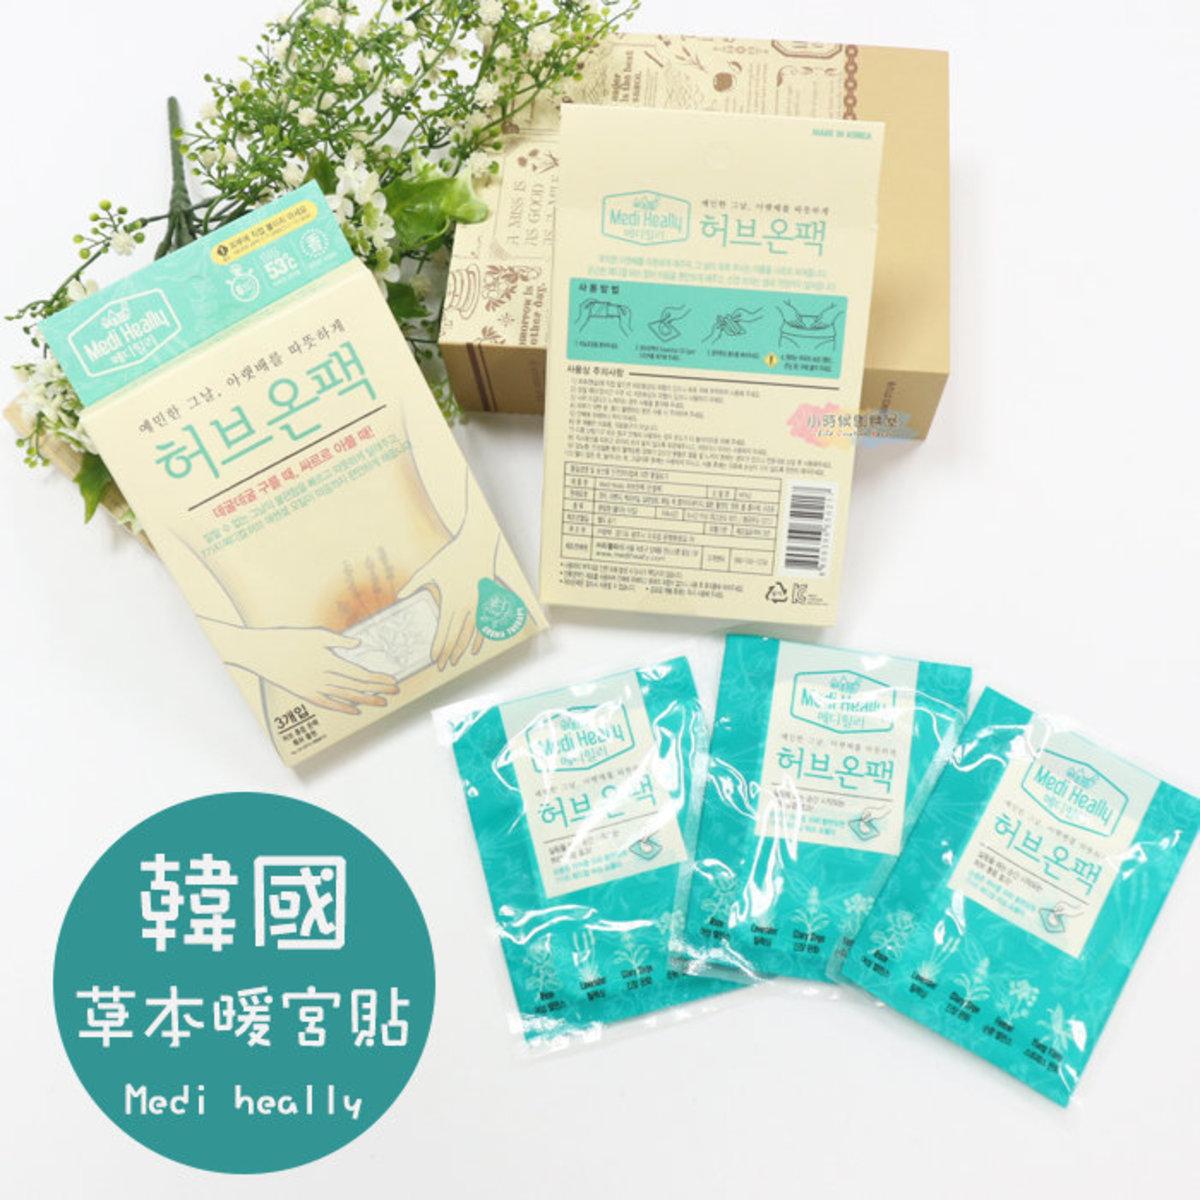 Medi Heally - 草本天然香暖宮貼 (10片入)